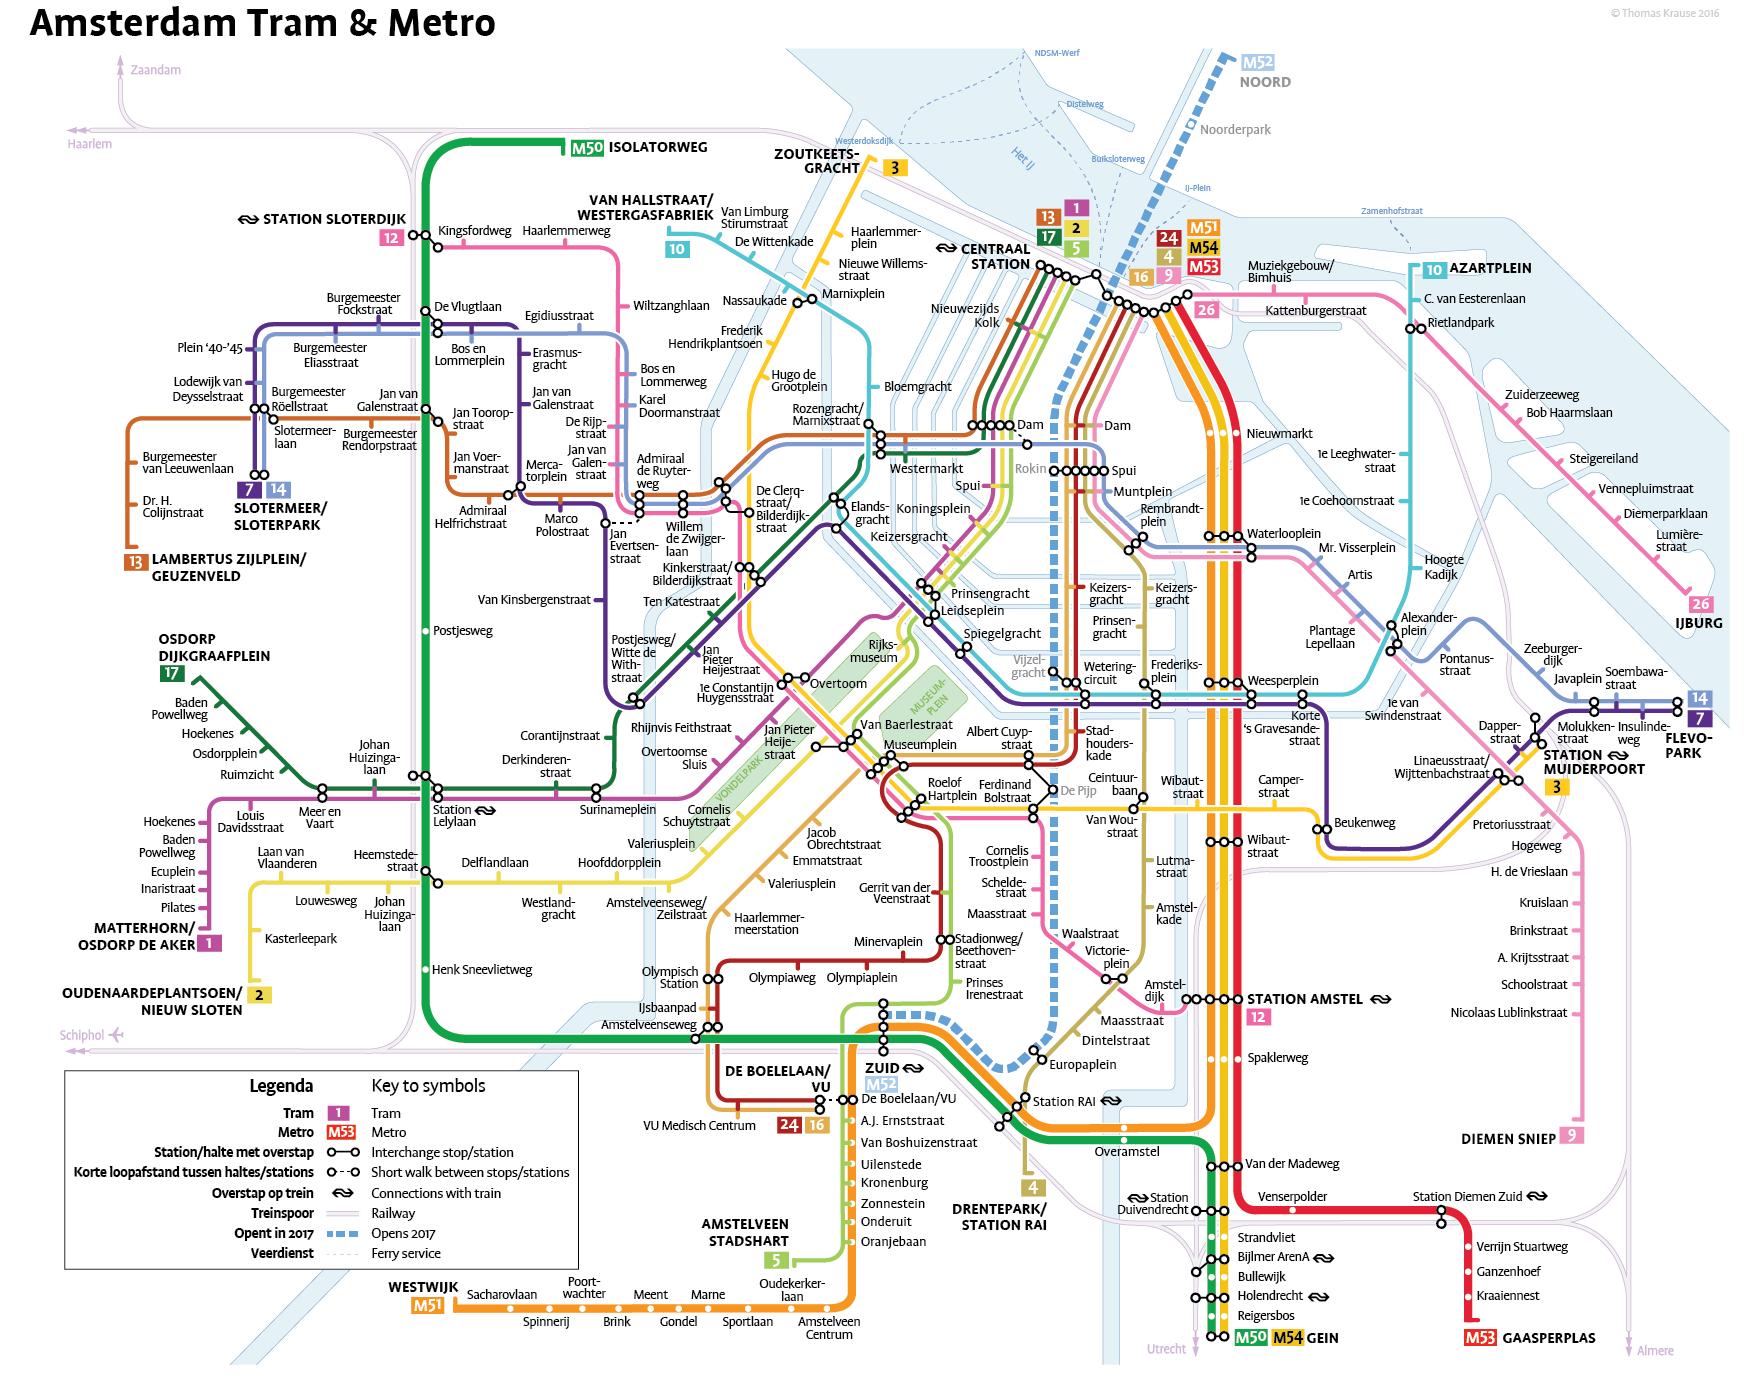 File:Tram & Metro Amsterdam 2016.png - Wikimedia Commons